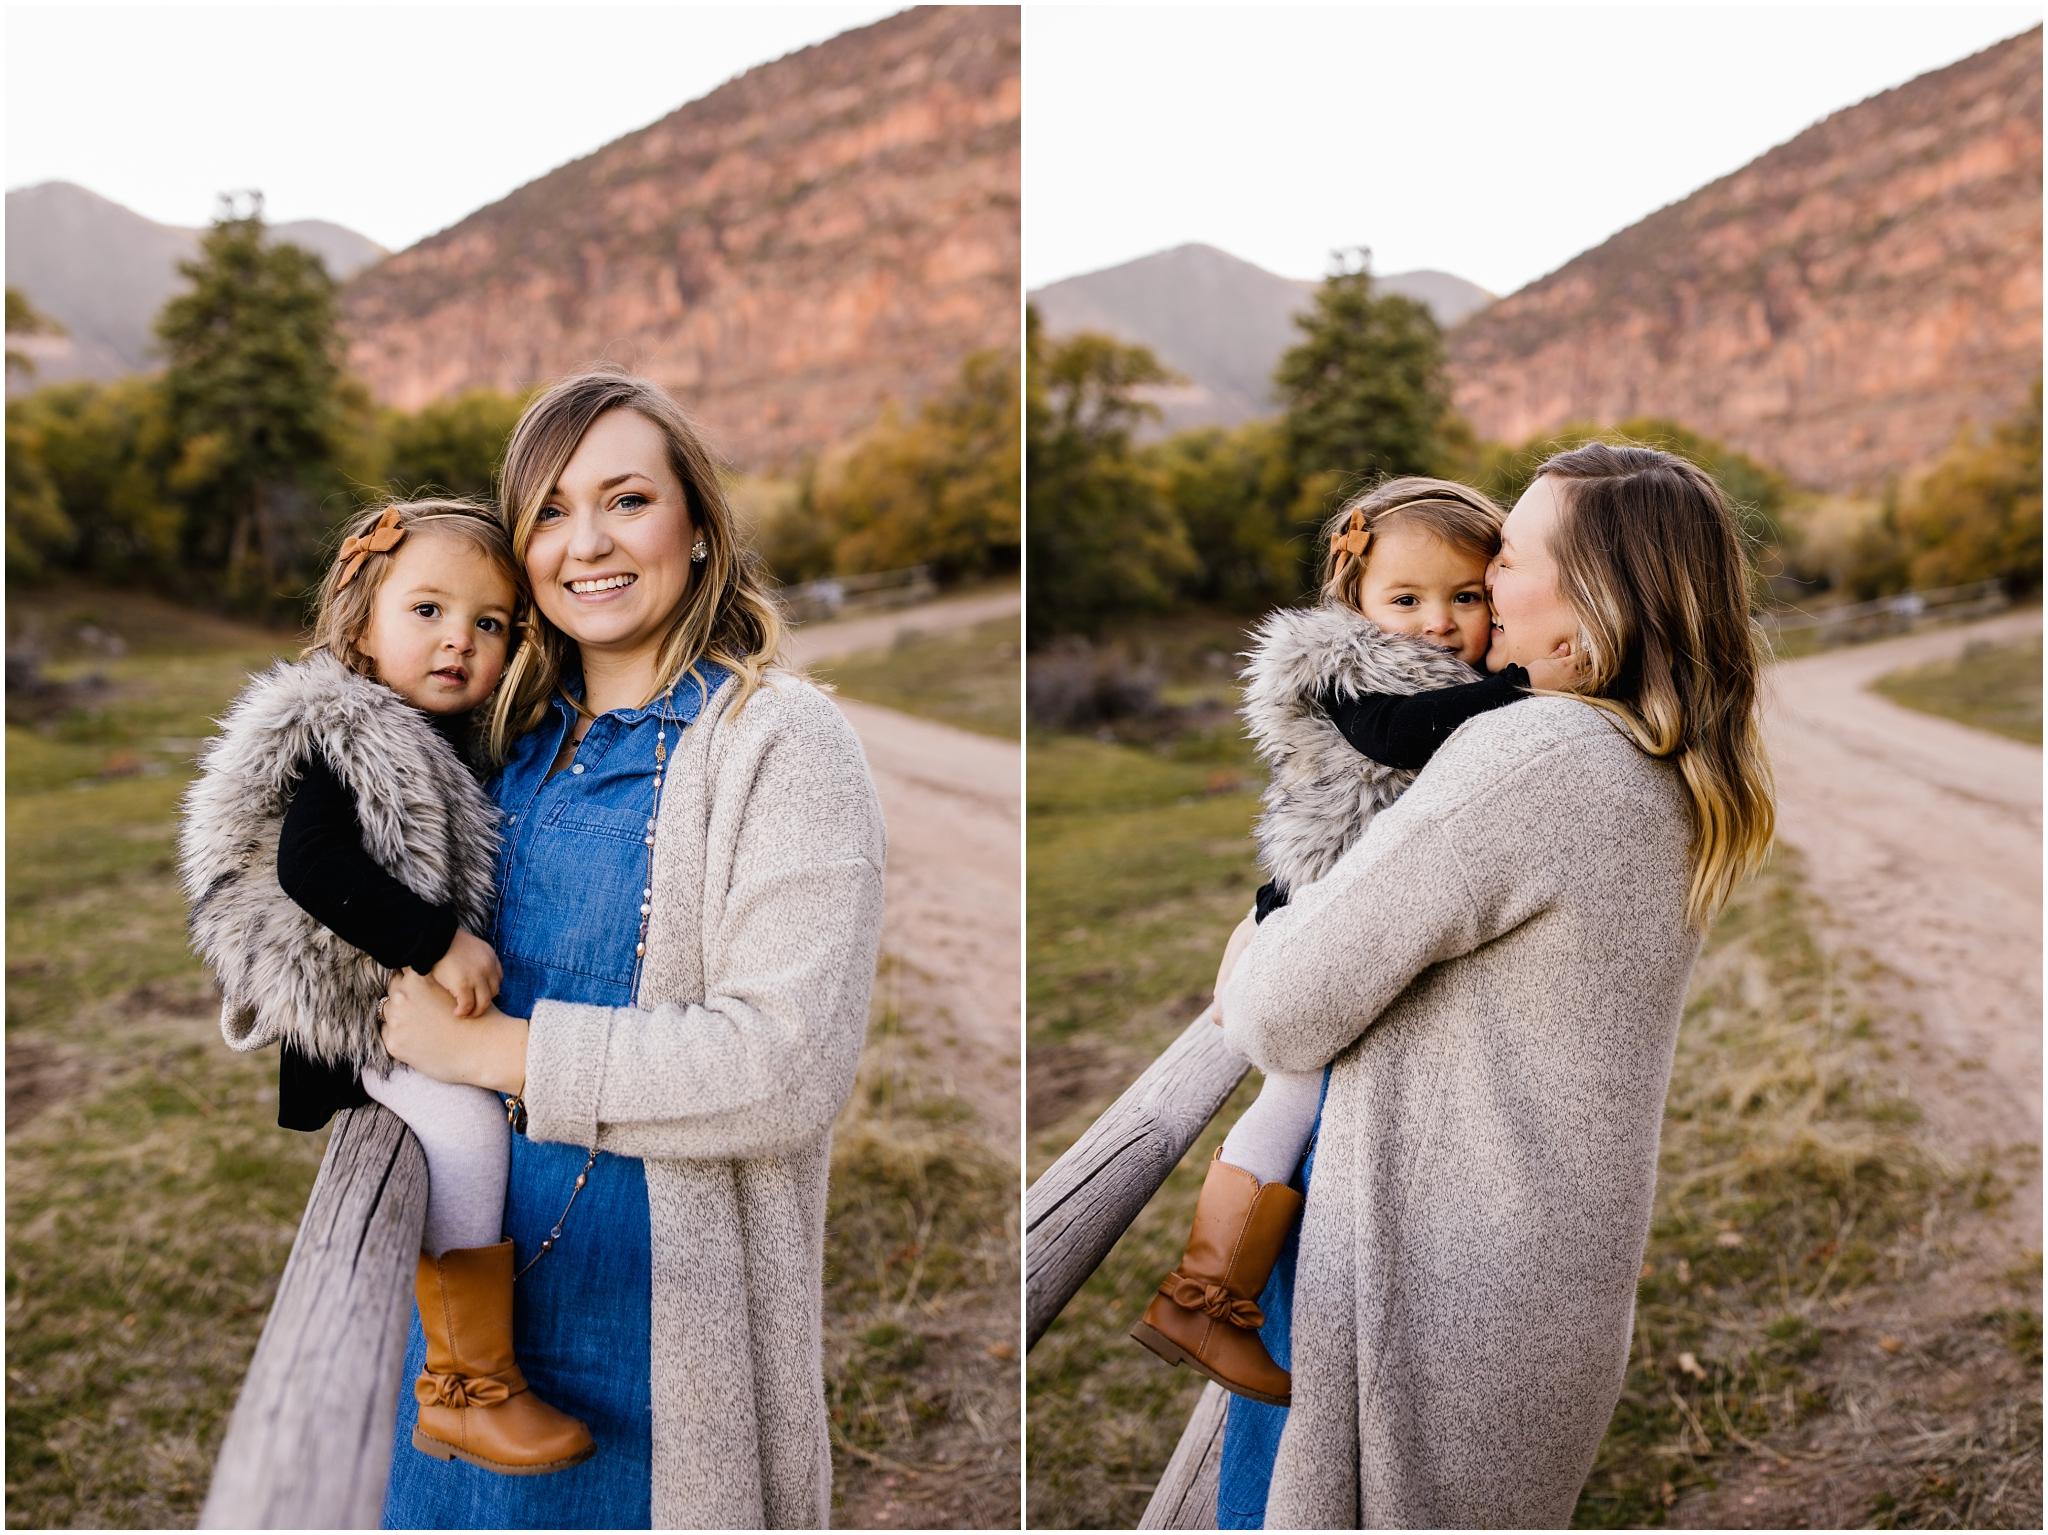 Frandsen-60_Lizzie-B-Imagery-Utah-Family-Photographer-Utah-County-Central-Utah-Park-City-Salt-Lake-City.jpg